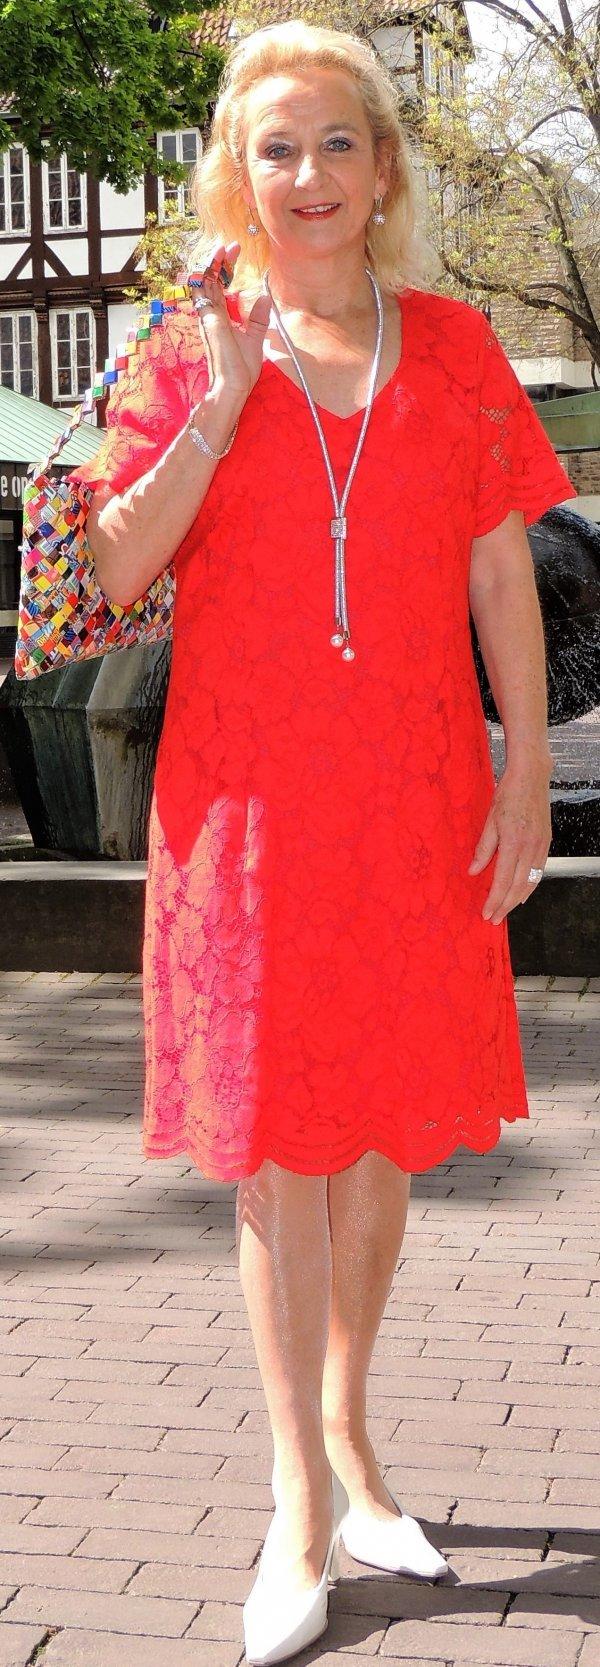 Kleid, komplett in Spitze, rot. Marke Batida